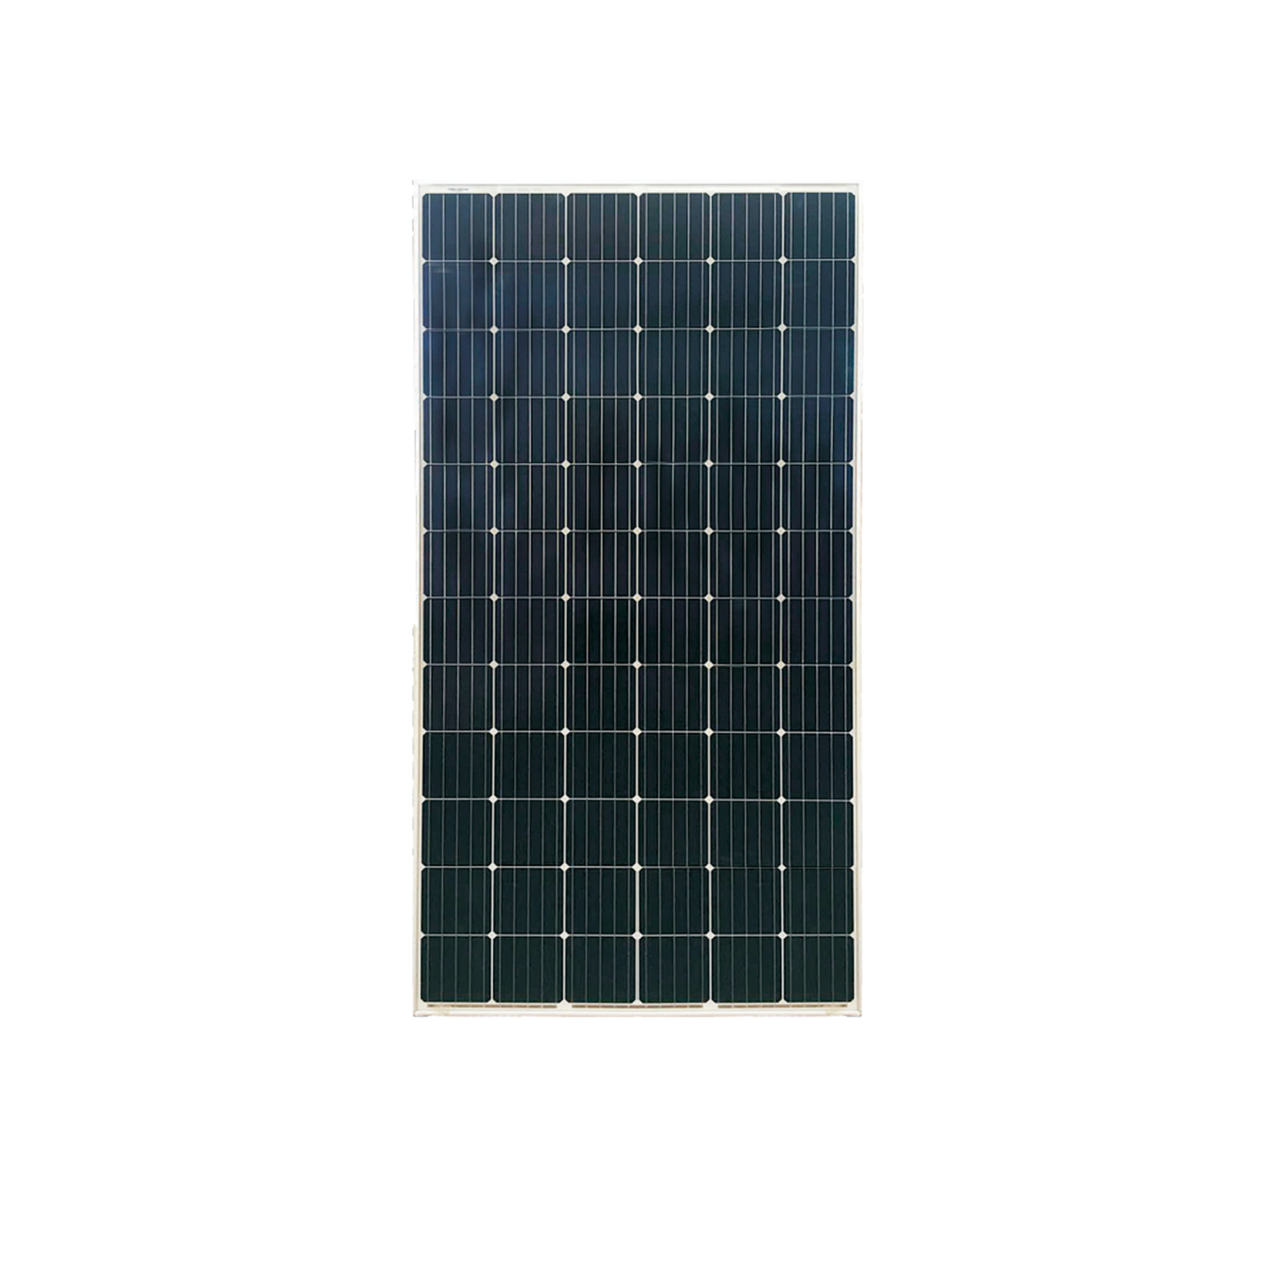 Солнечная батарея RISEN RSM72‐6‐370M 5BB PERC, 370 Вт (монокристалл)